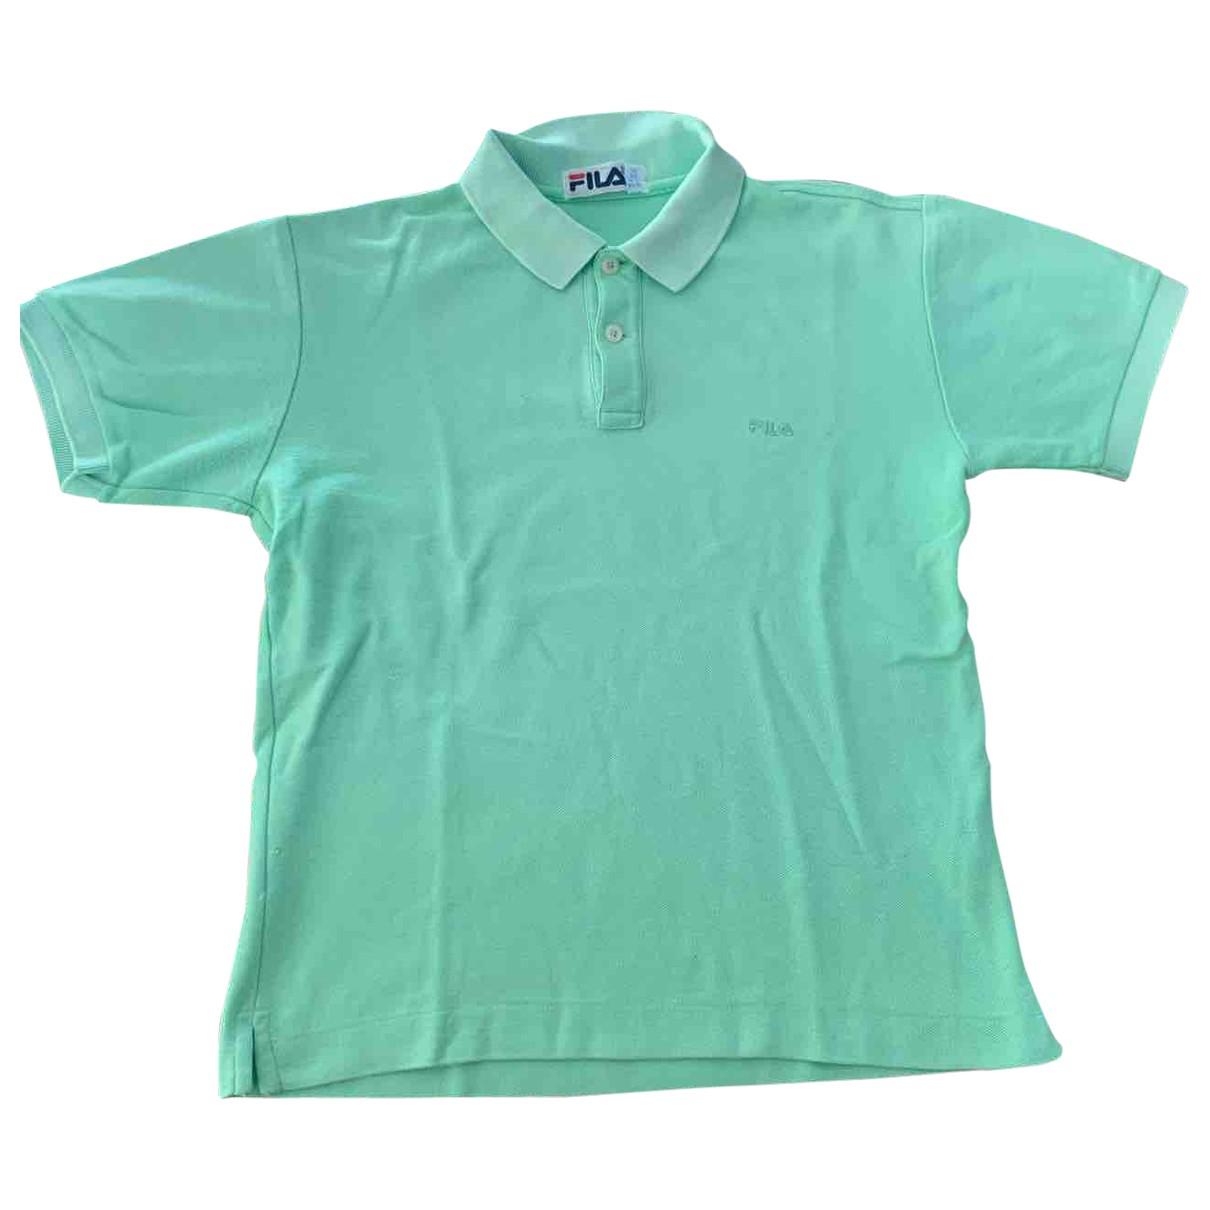 Fila \N Turquoise Cotton Polo shirts for Men XS International